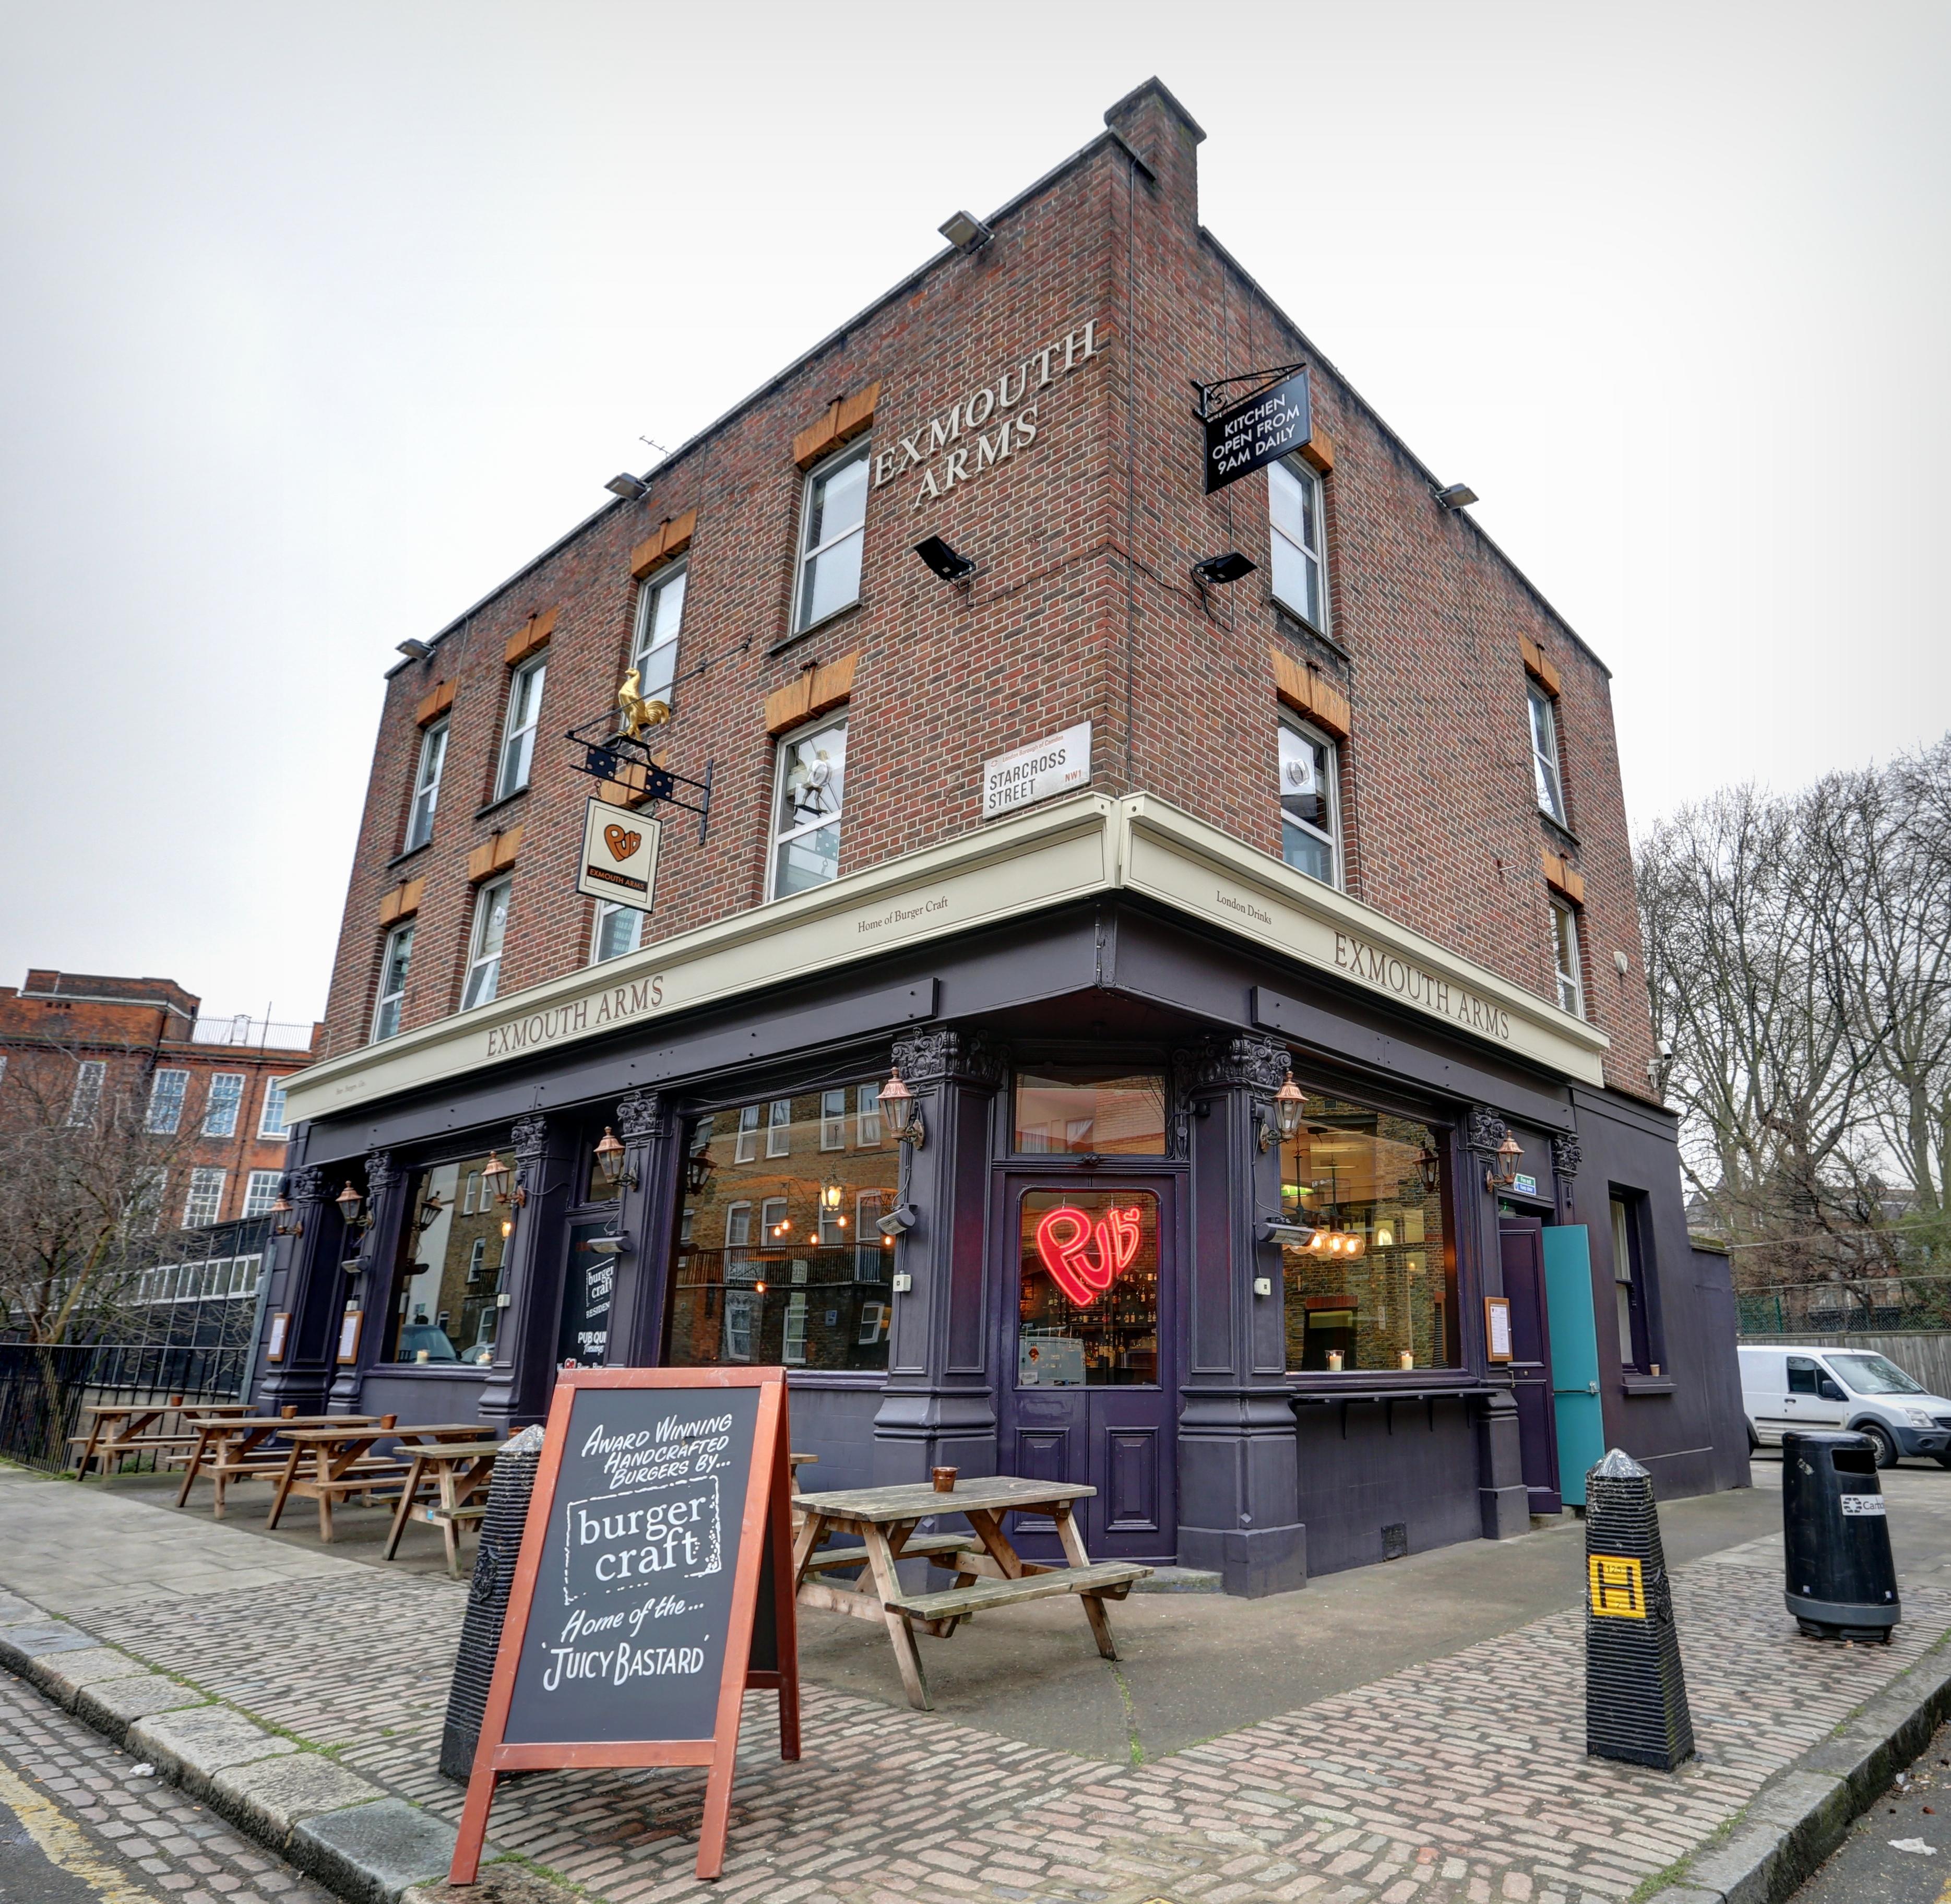 HOSTEL - PubLove @ The Exmouth Arms, Euston